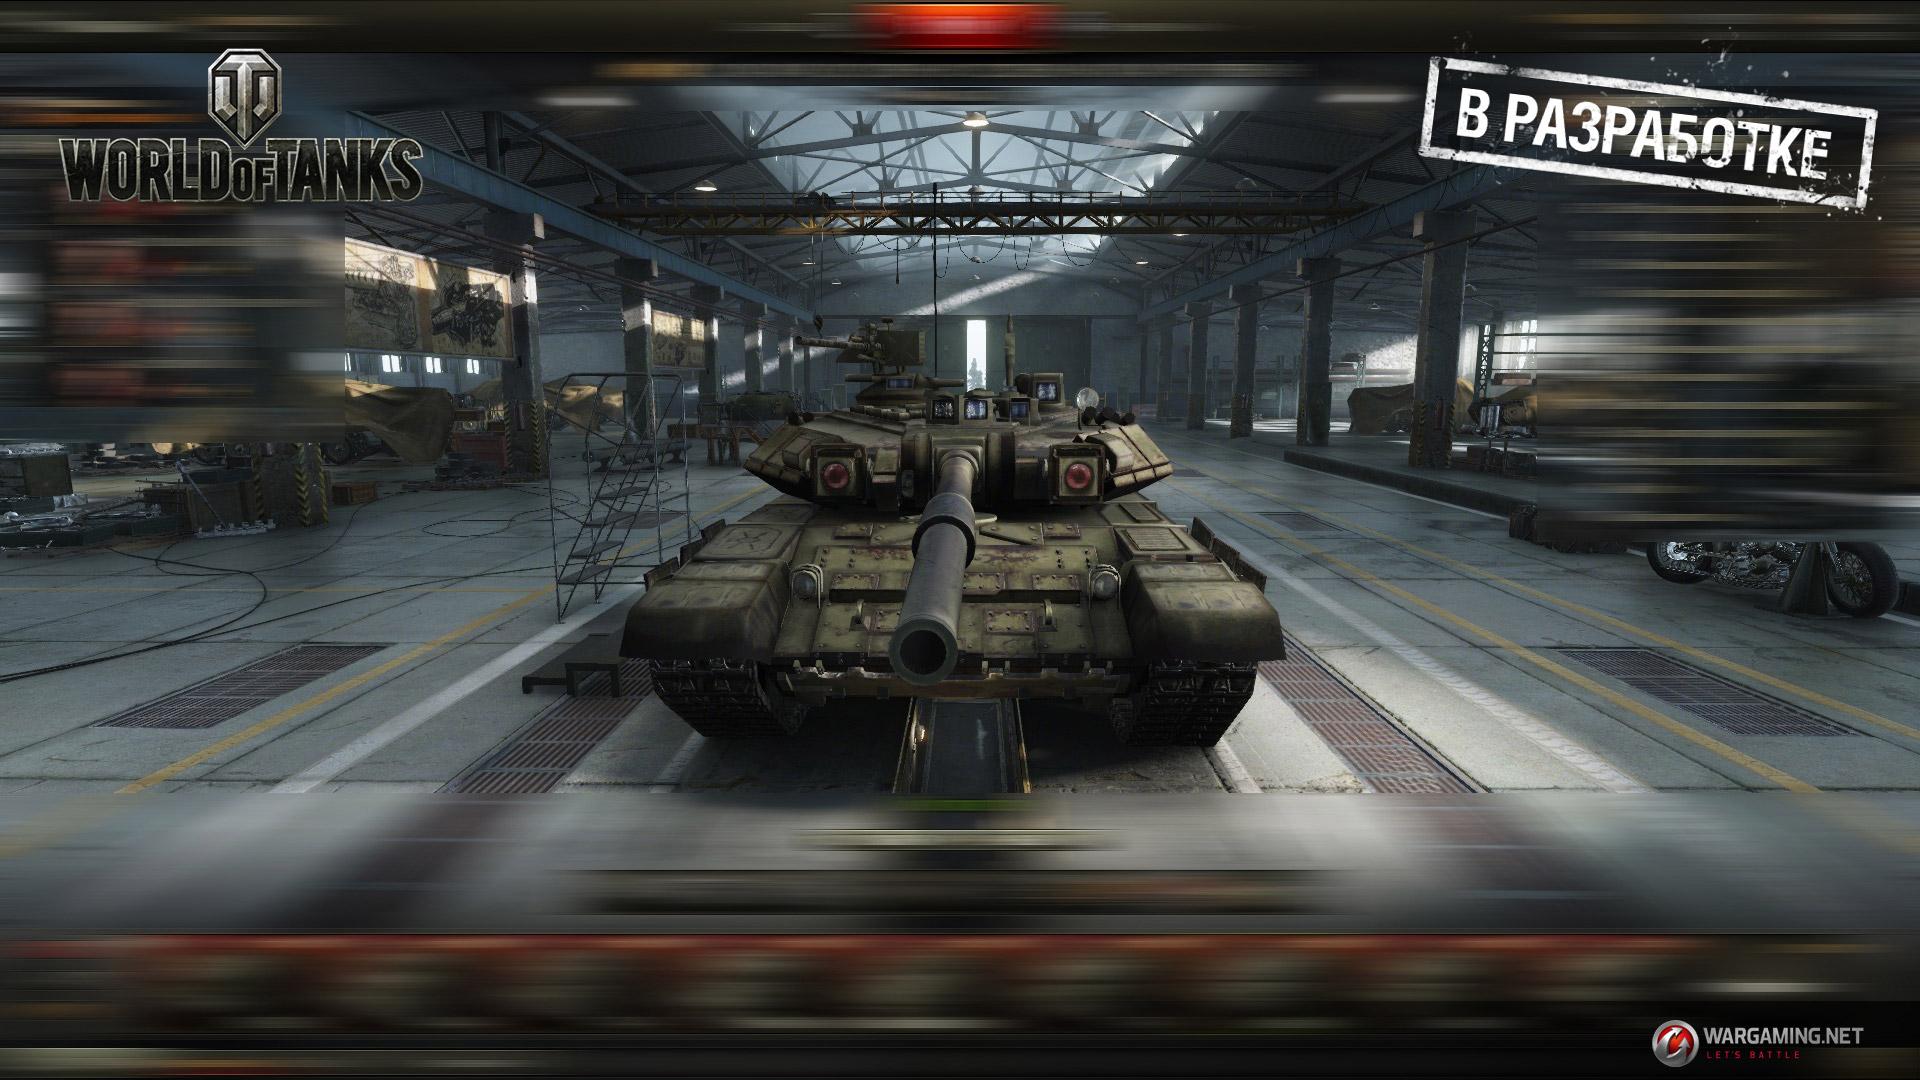 Белые трупы танков для wot blitz 4. 9 | world of tanks blitz 4. 10.